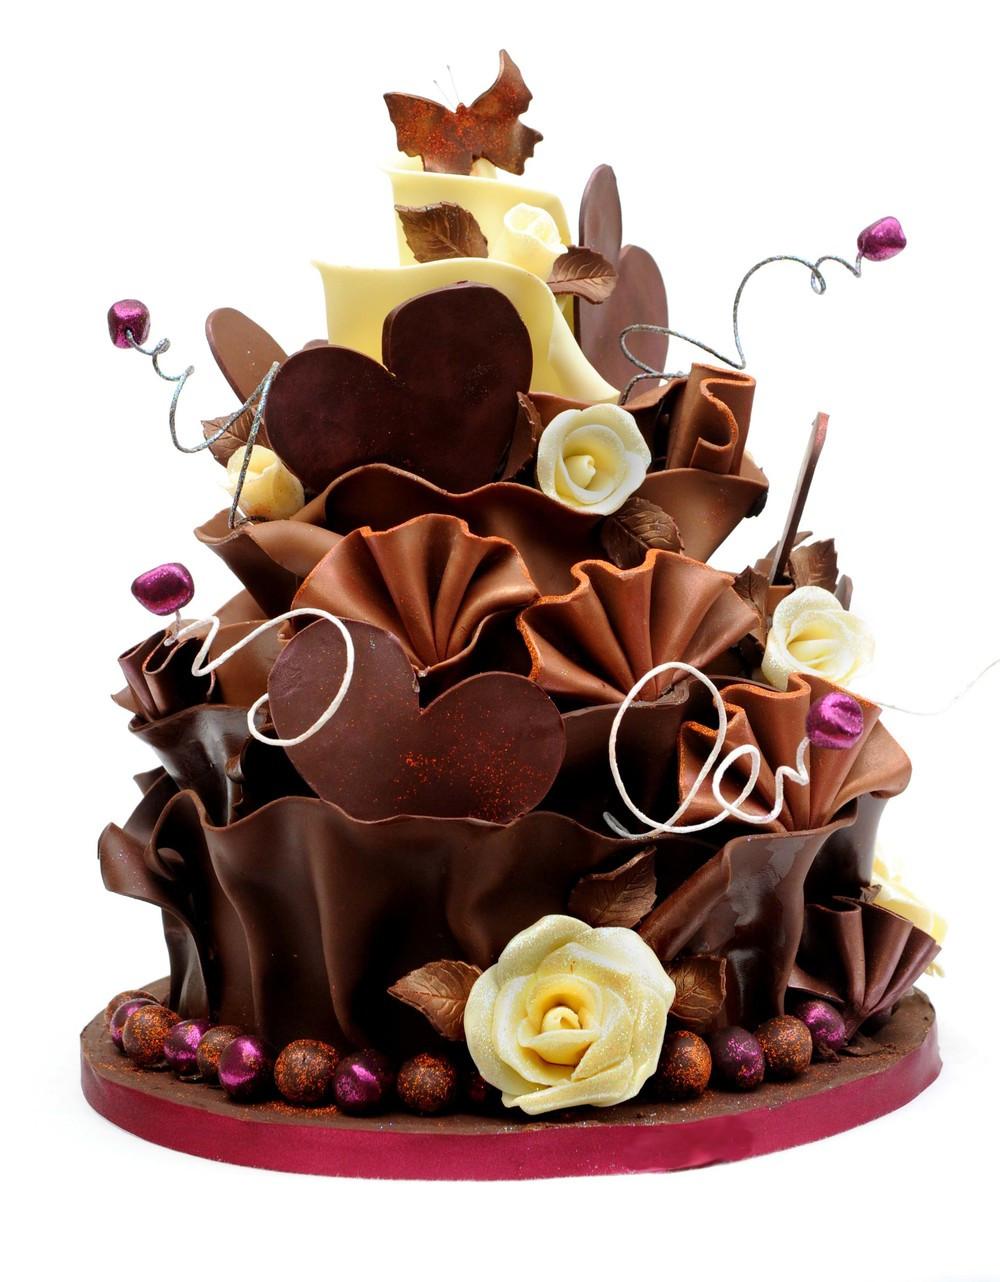 Good Birthday Cakes  Chocolate Birthday Cakes Happy Birthday Wishes